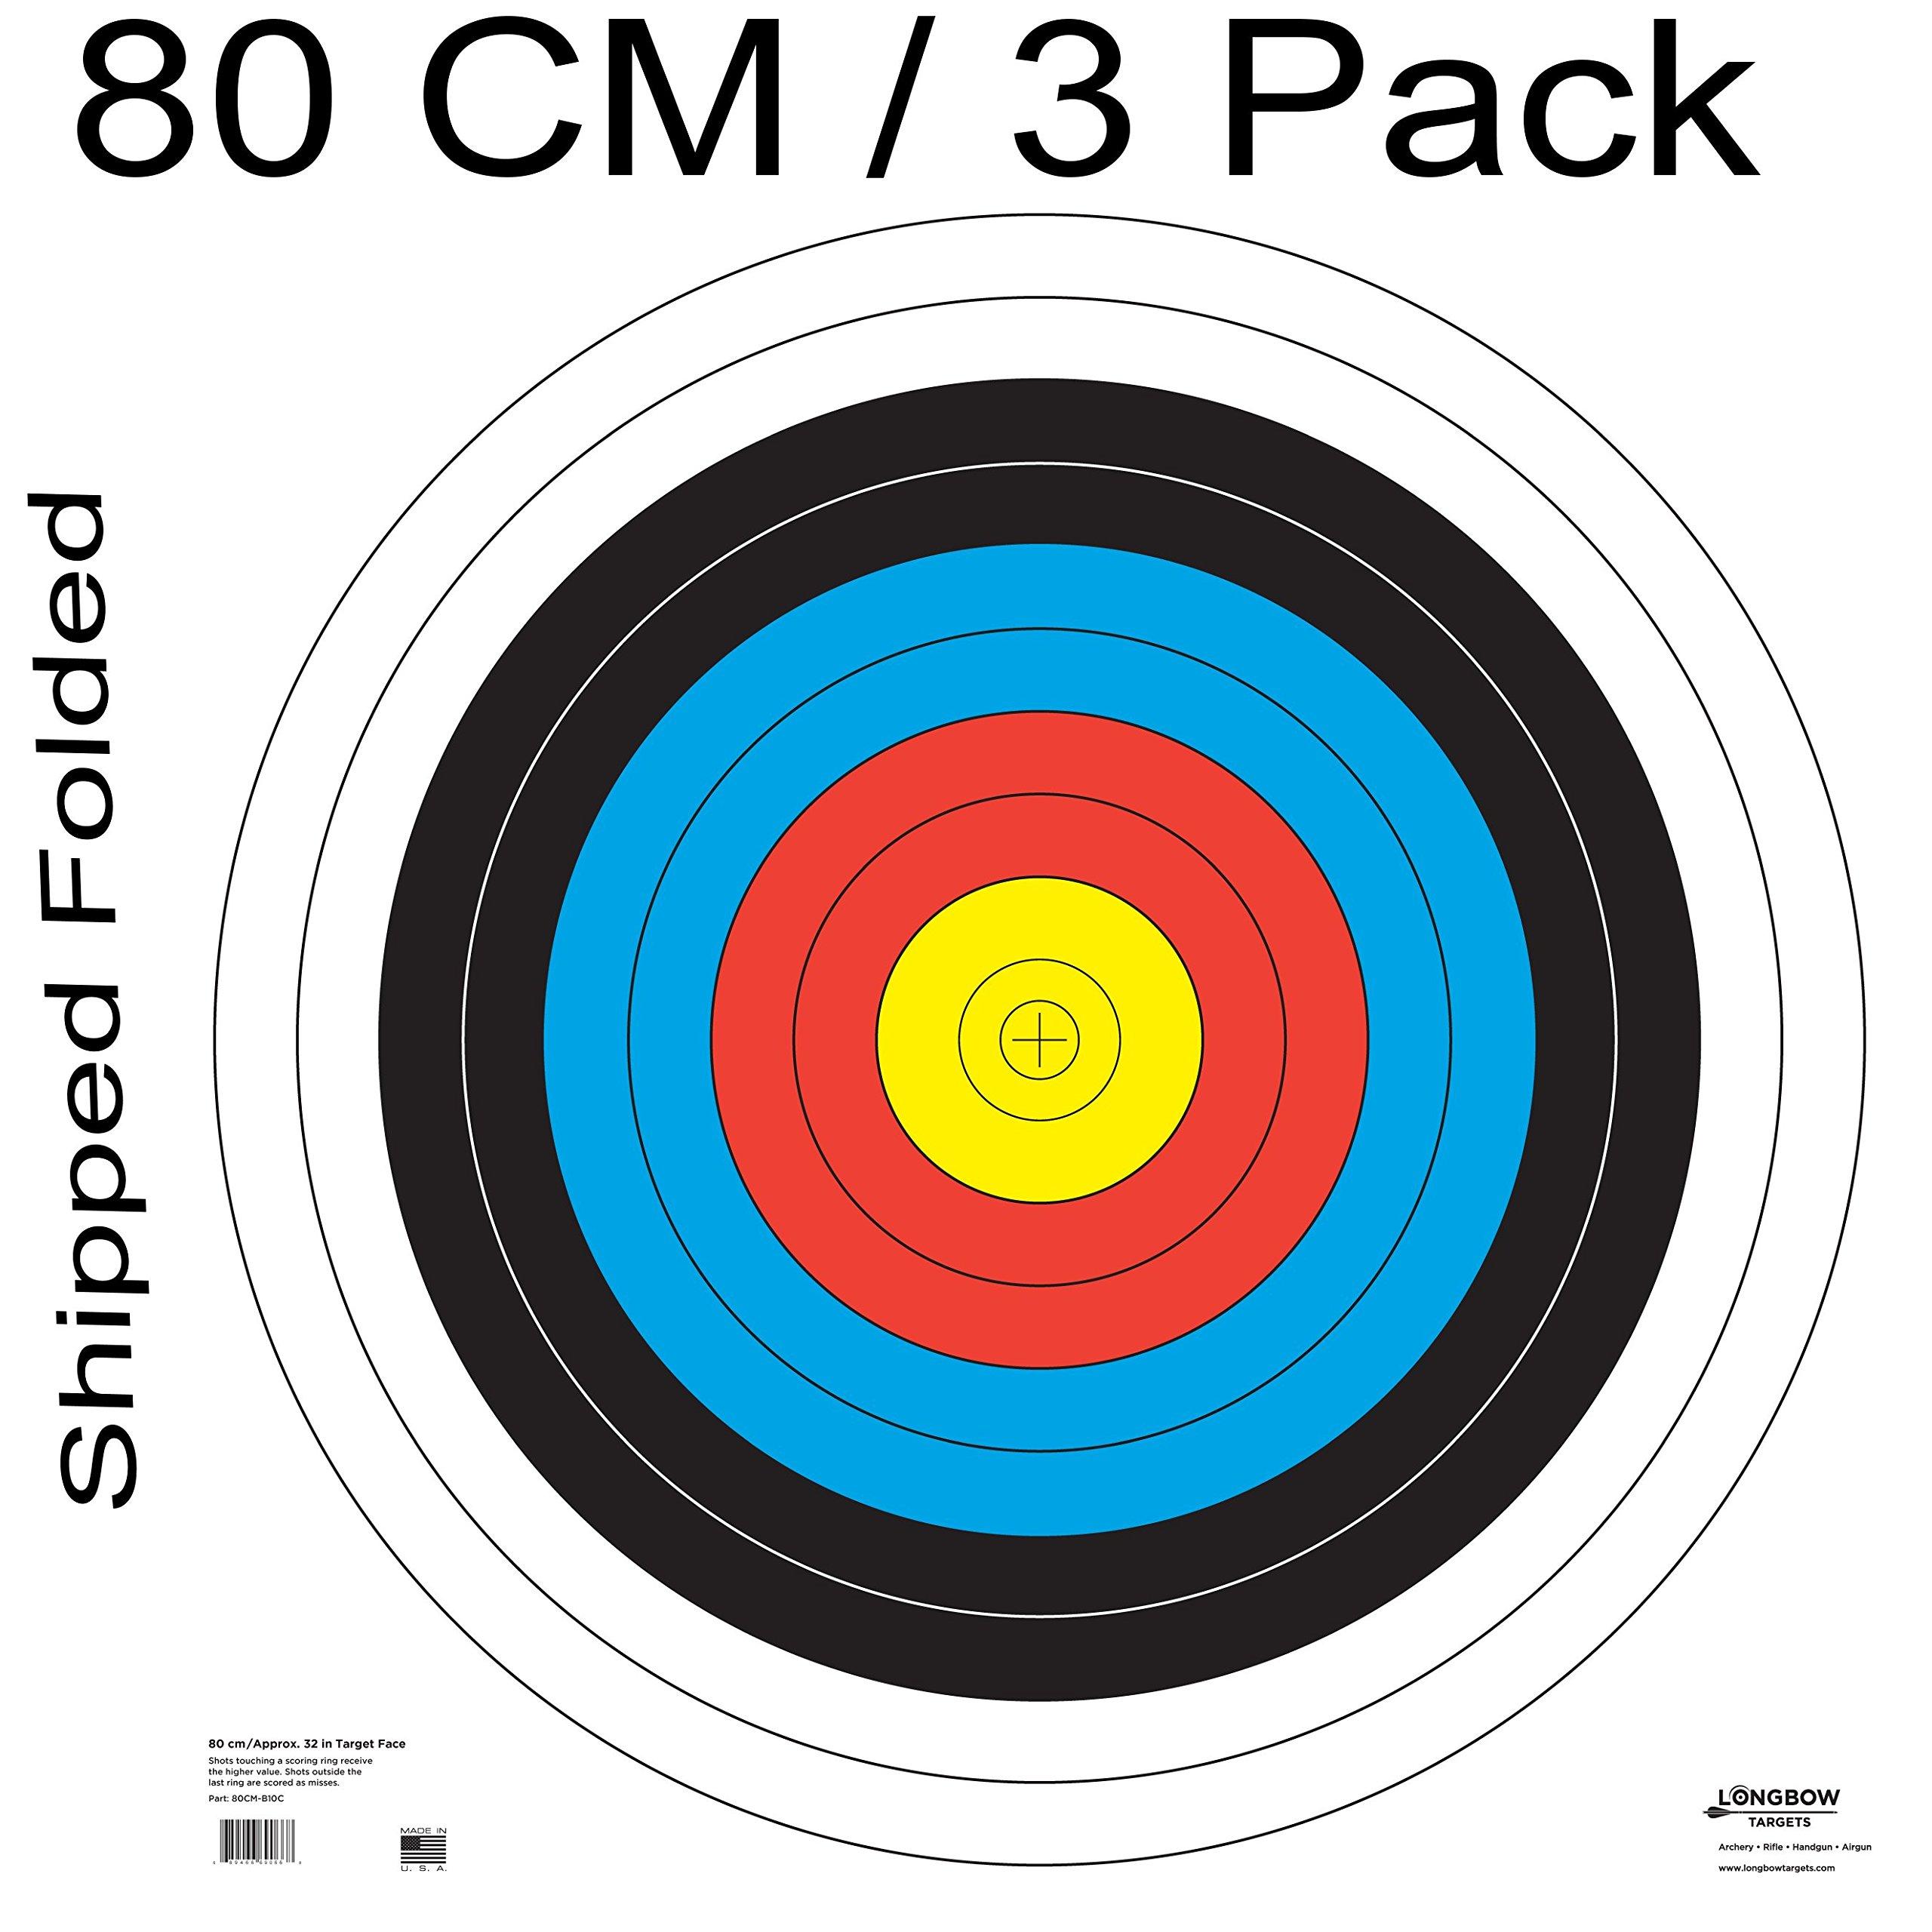 Archery 40cm & 80cm Targets by Longbow (3 Pack (80cm) Folded, 80cm Archery Paper)